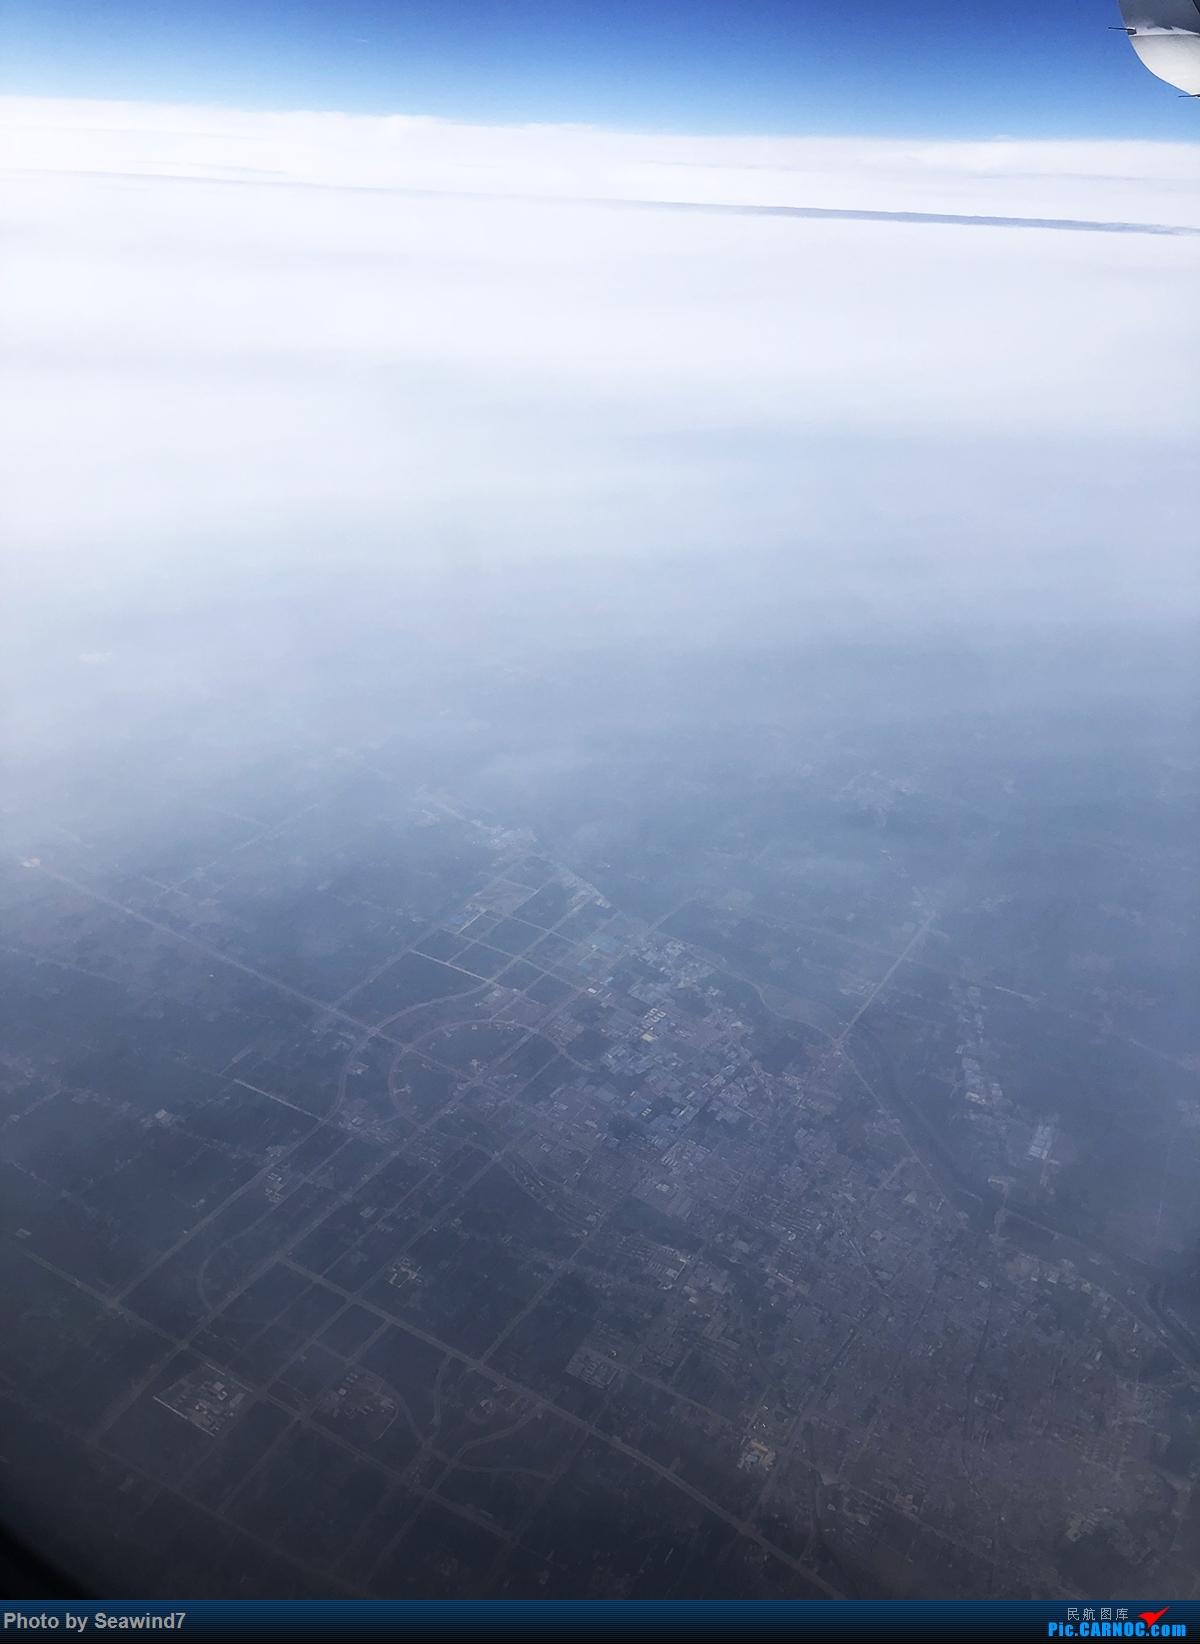 Re:[原创][Seawind7游记第五弹]银川neo往返